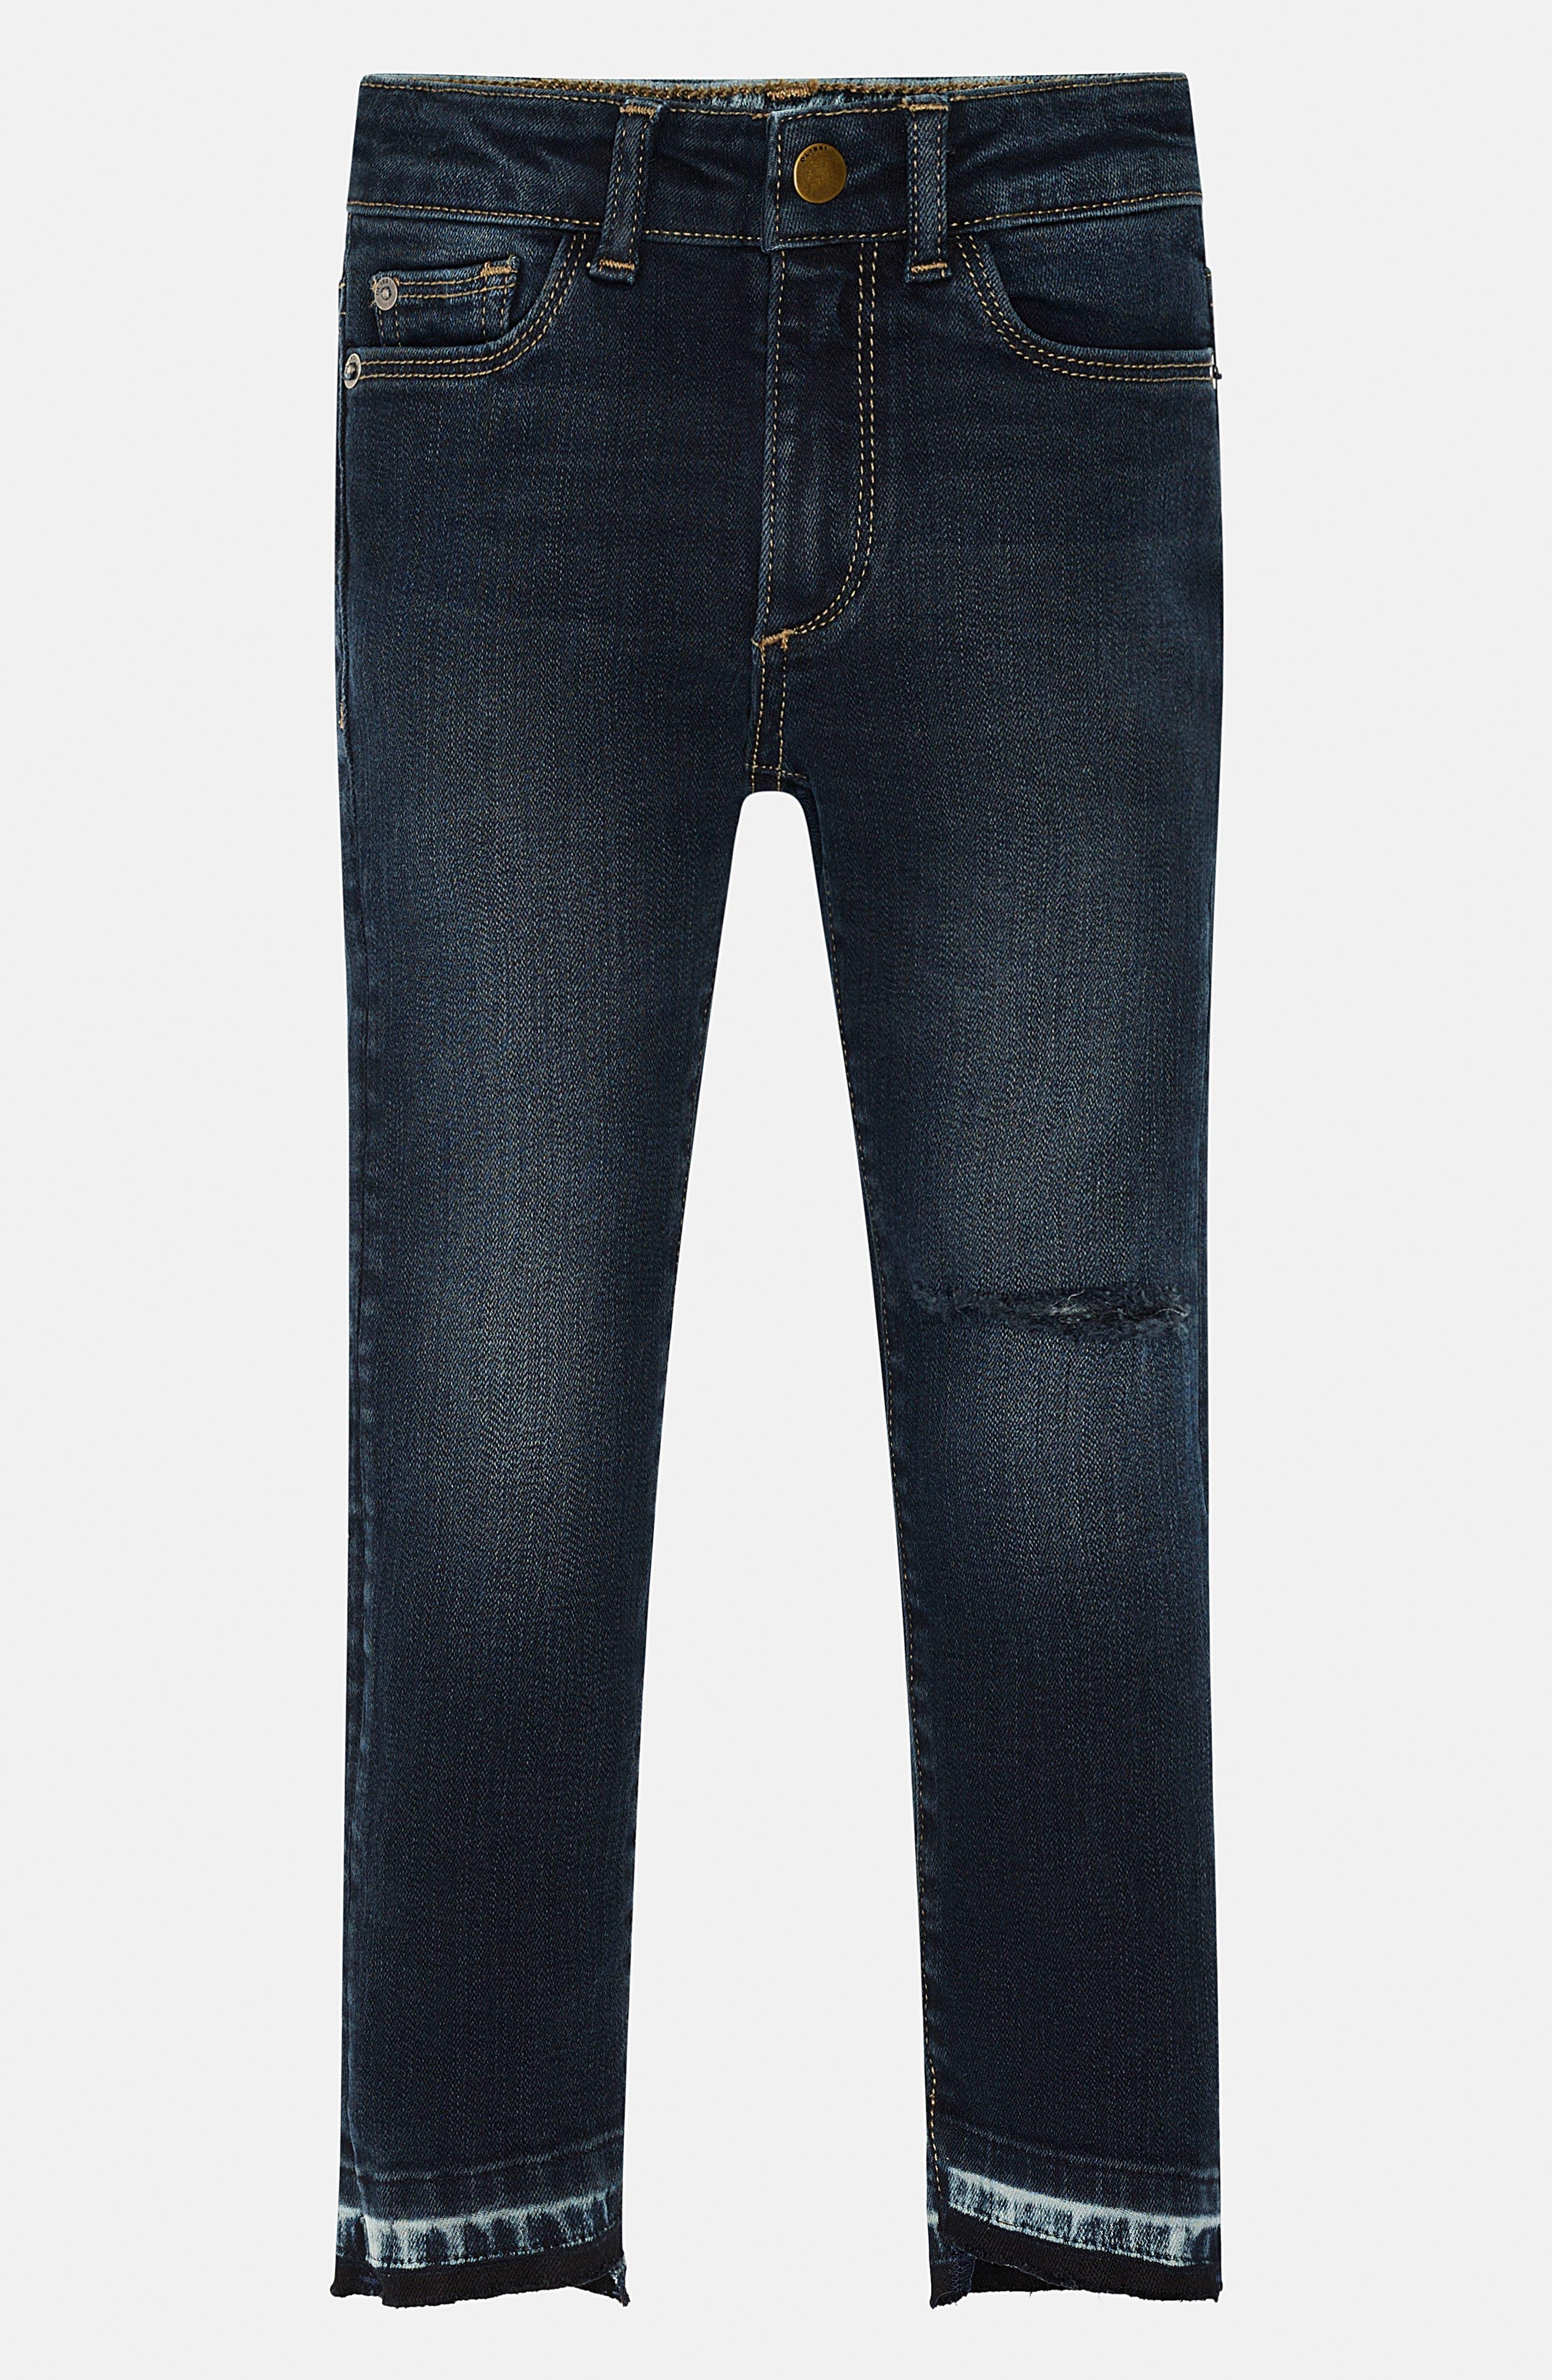 Chloe Distressed Skinny Jeans,                         Main,                         color, 401